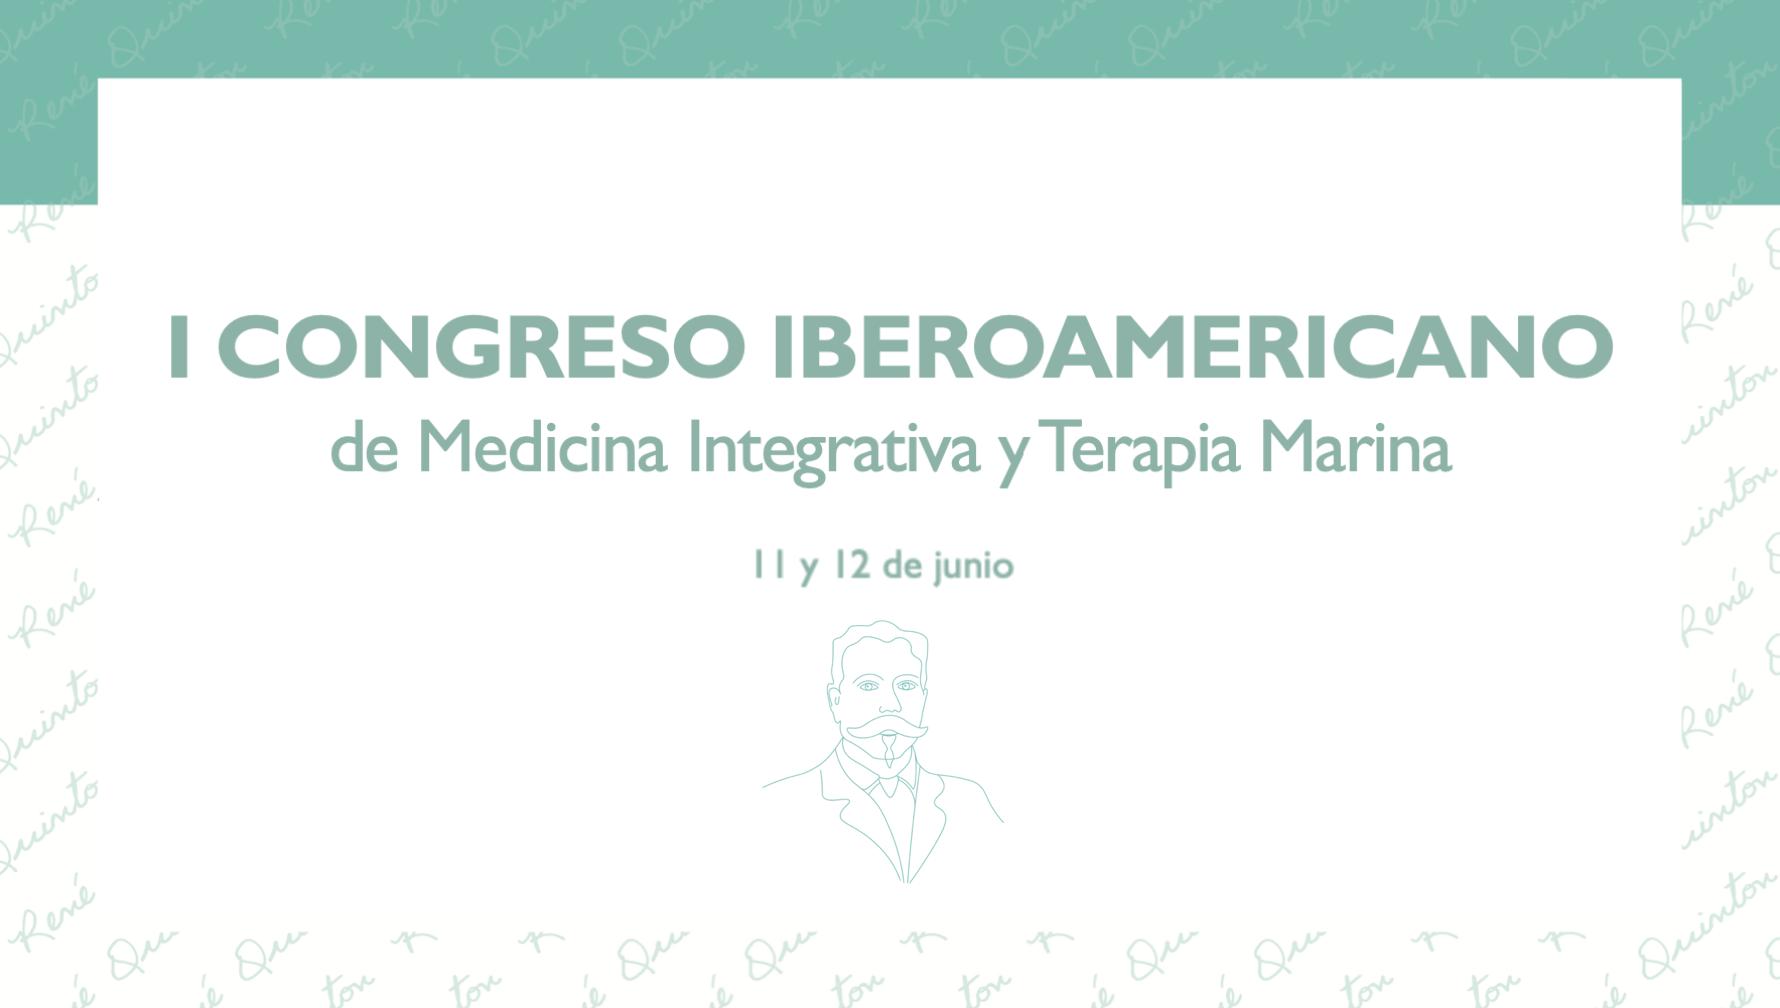 Fotografia Primer Congreso Iberoamericano de Medicina Integrativa y